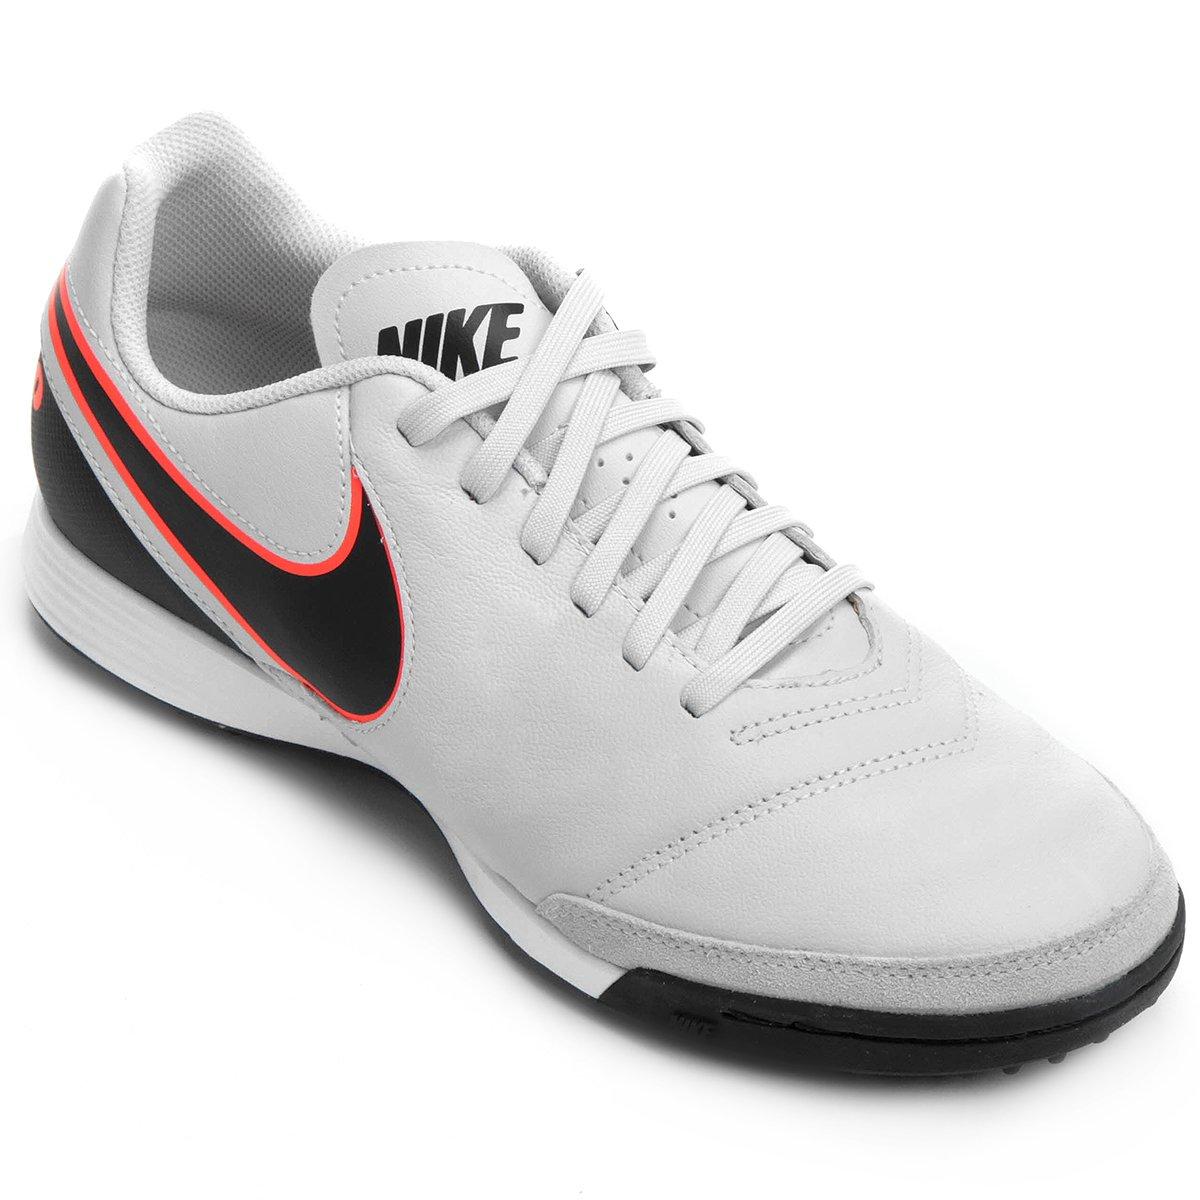 841f0f9198 Chuteira Society Nike Tiempo Genio 2 Leather TF Masculina - Compre Agora